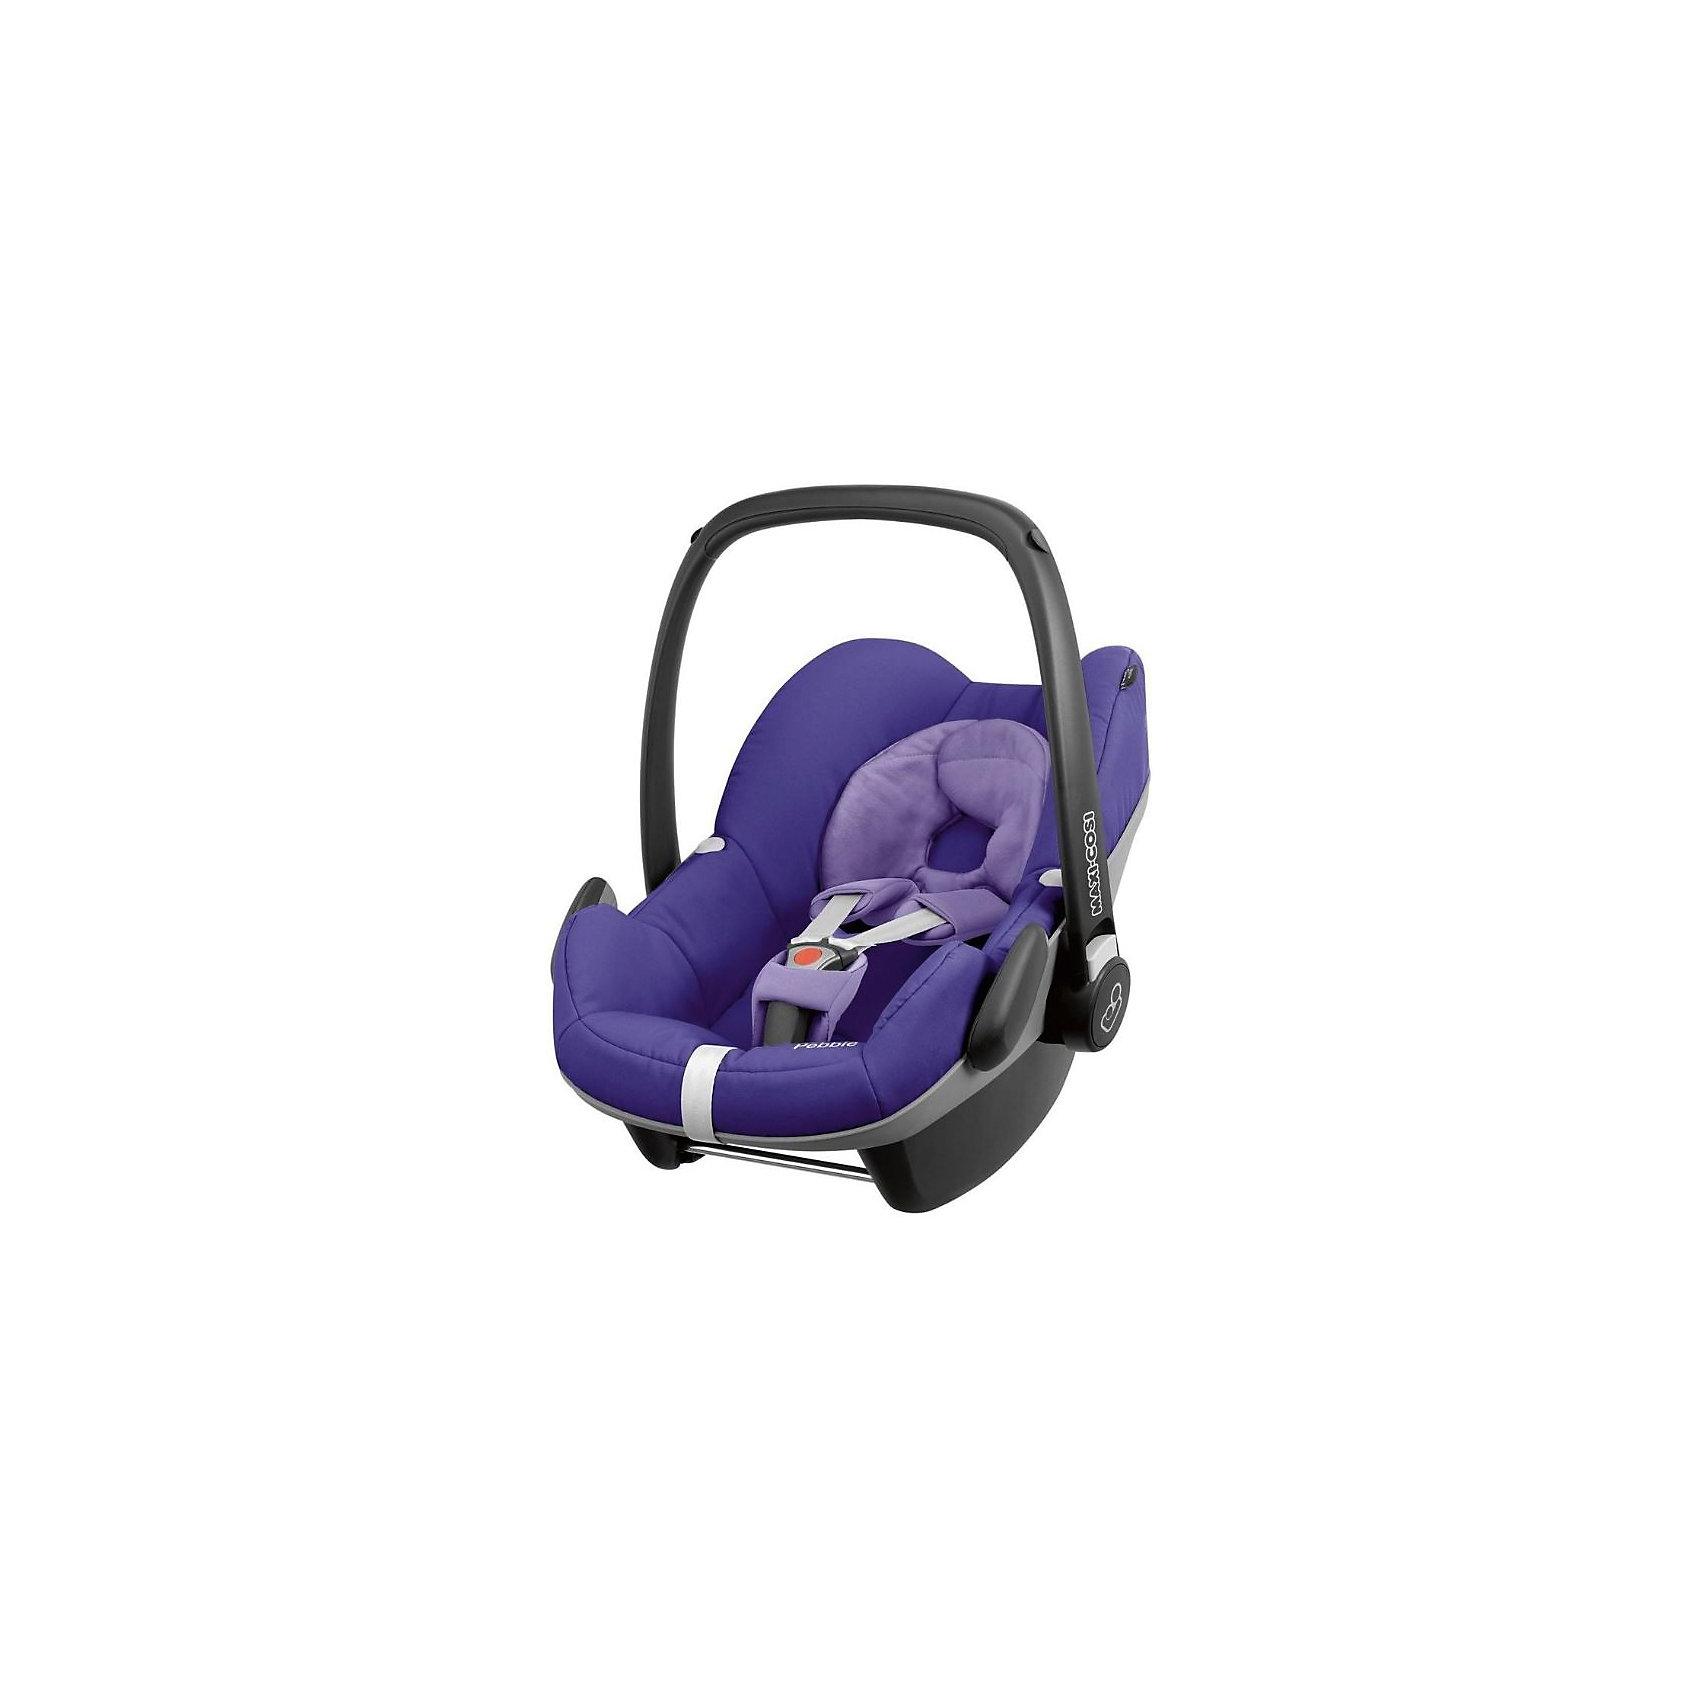 Maxi Cosi Автокресло Maxi-Cosi Pebble 0-13 кг, Purple Pace